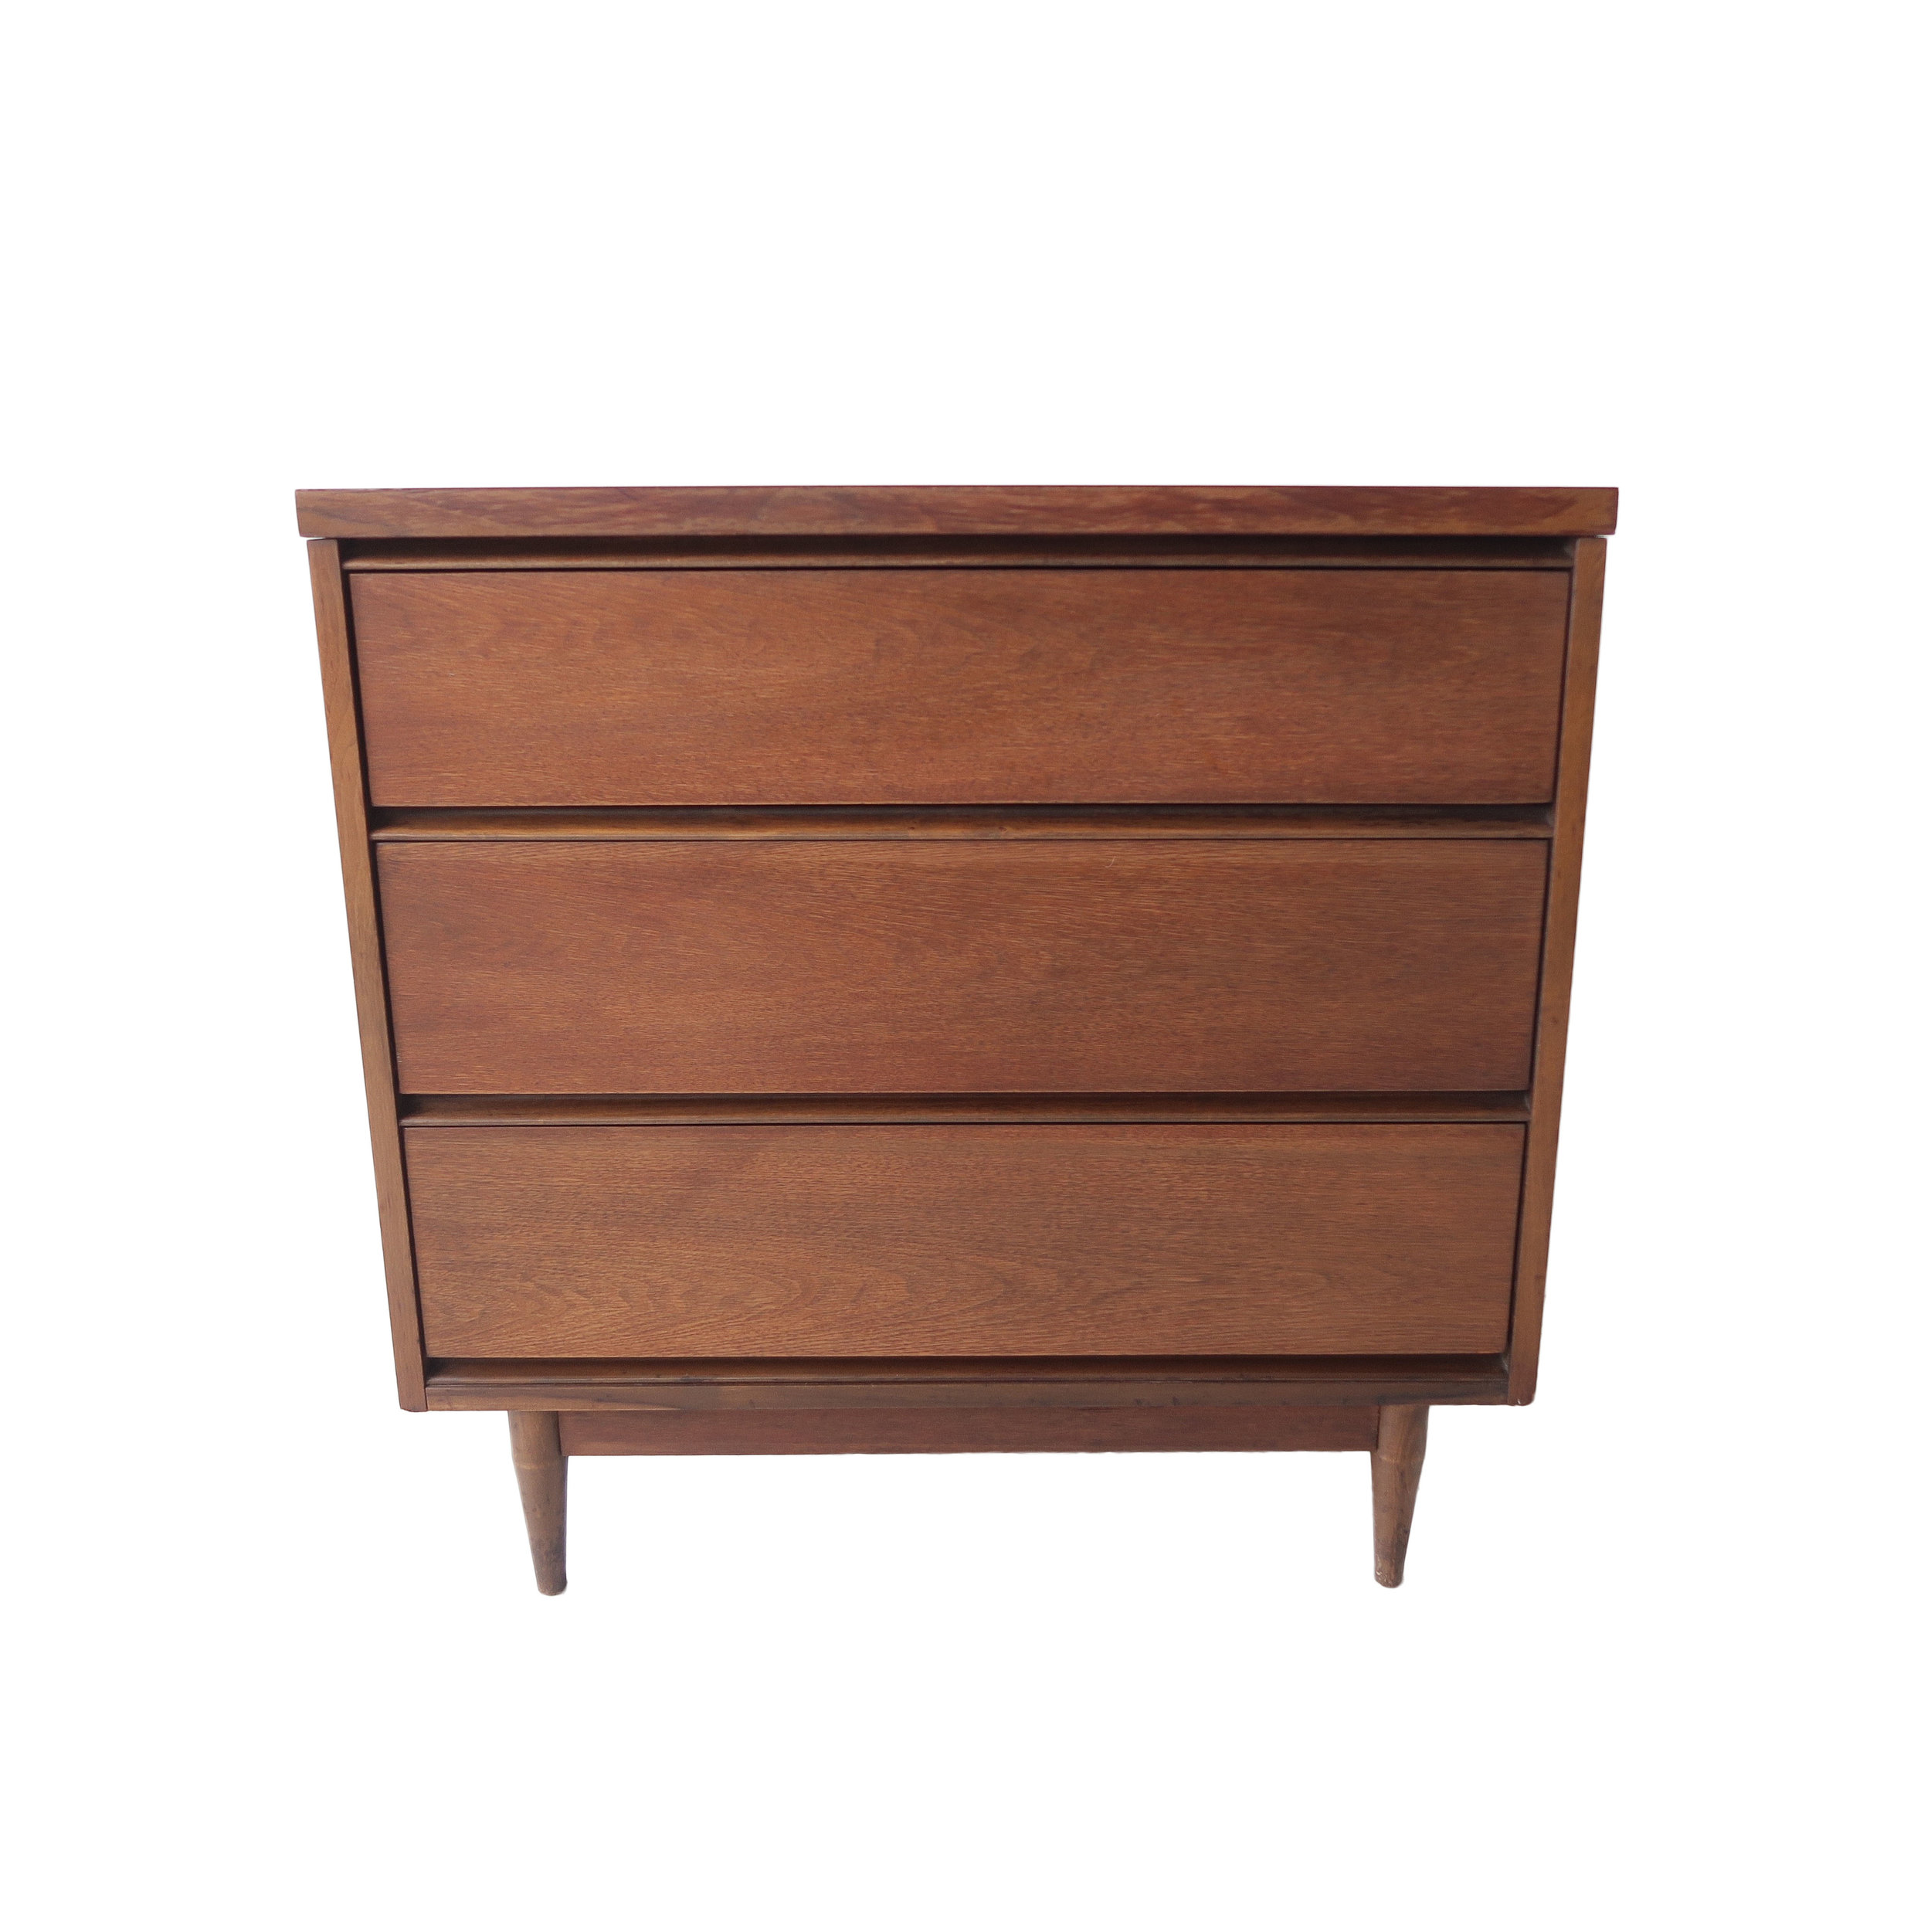 vintage mid century modern 3 drawer dresser copy.jpg